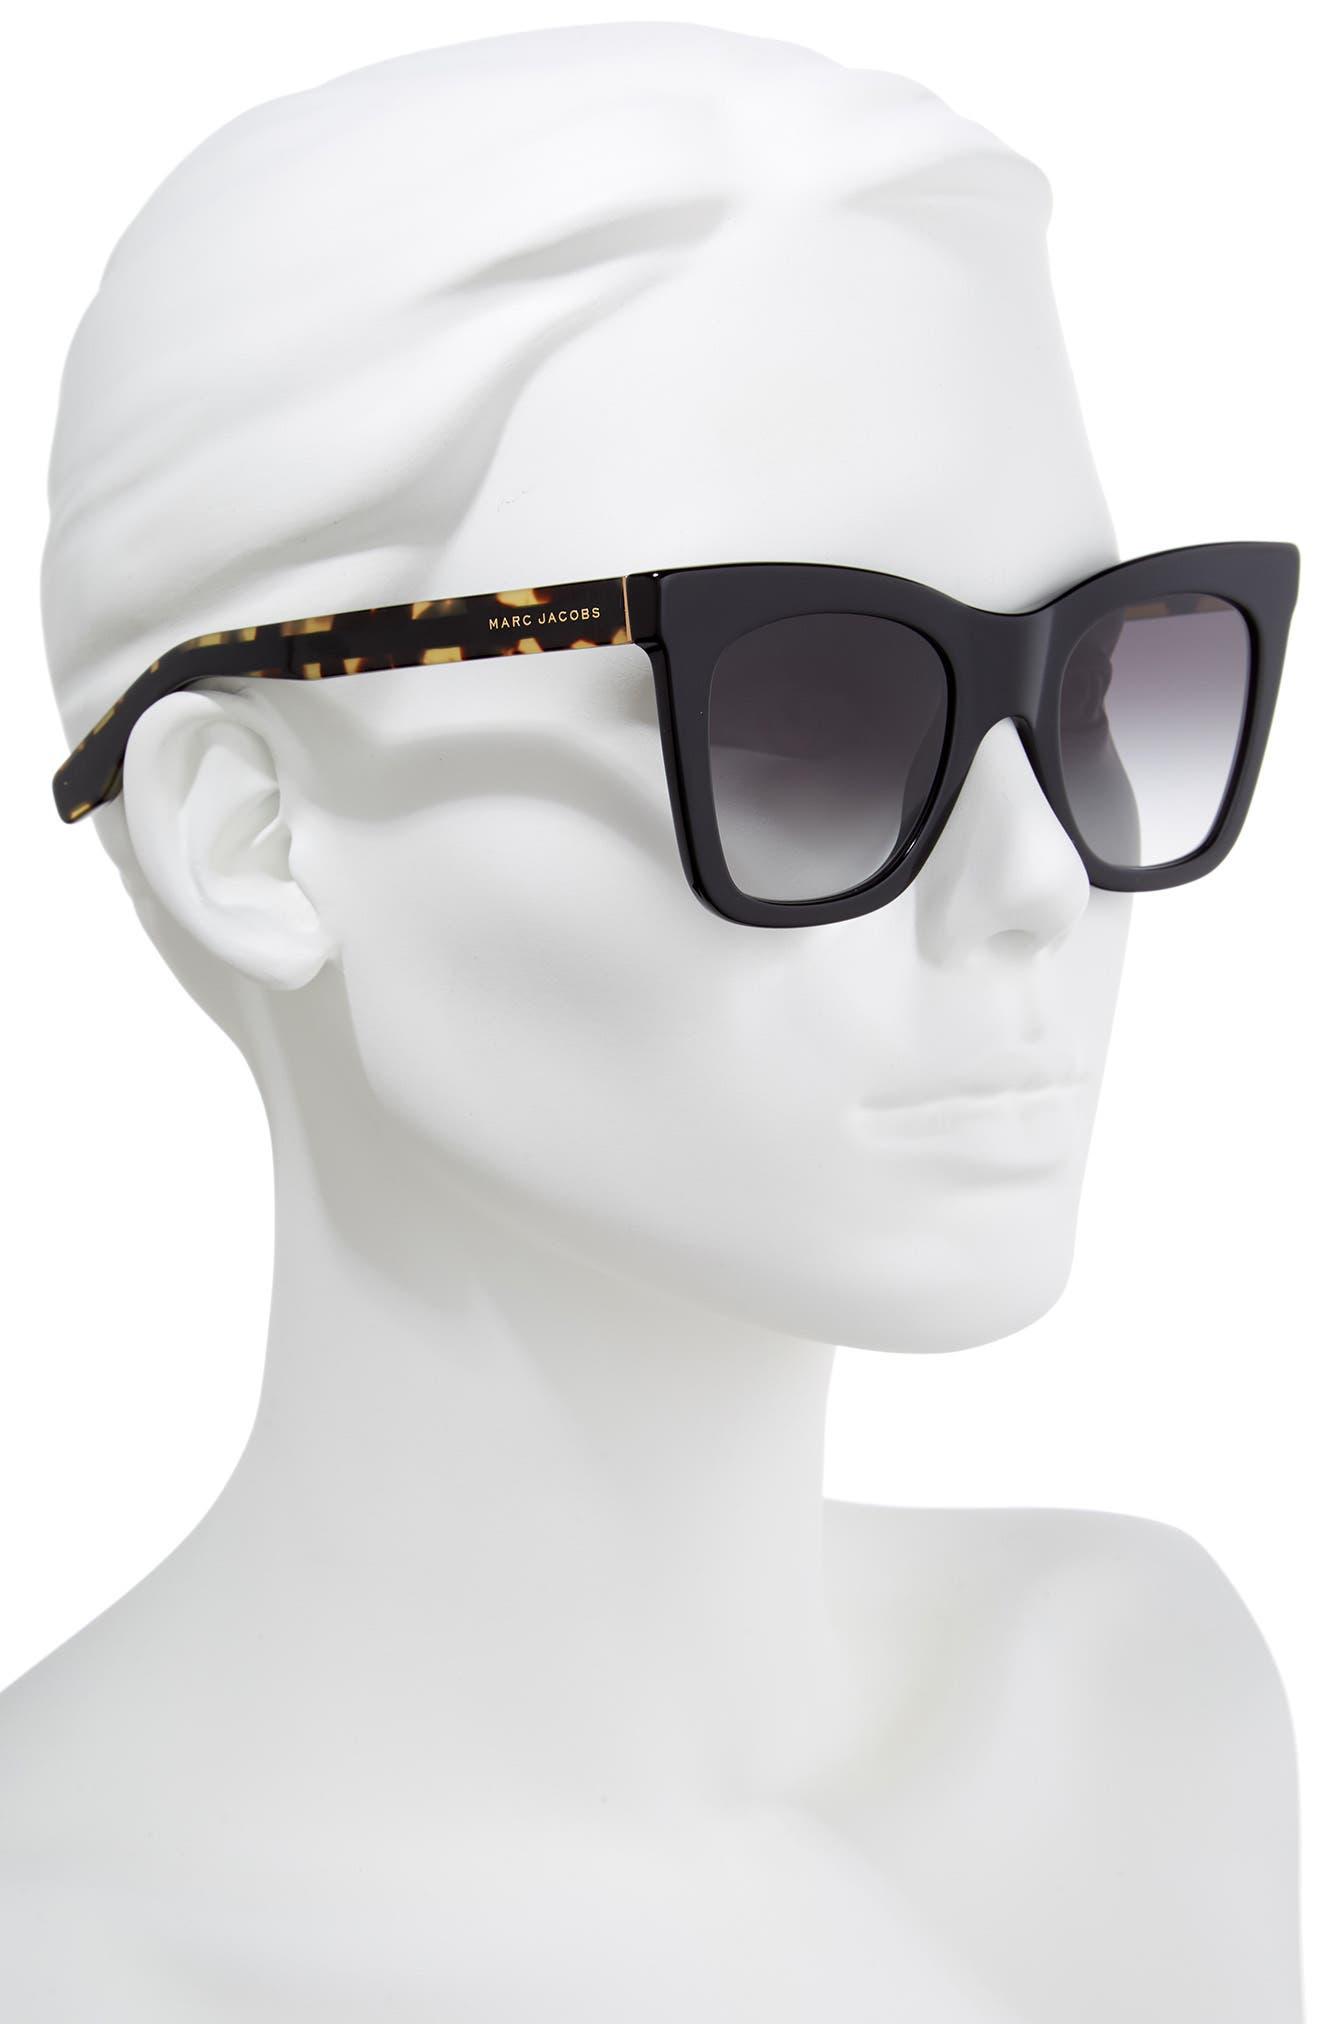 50mm Cat Eye Sunglasses,                             Alternate thumbnail 2, color,                             BLACK